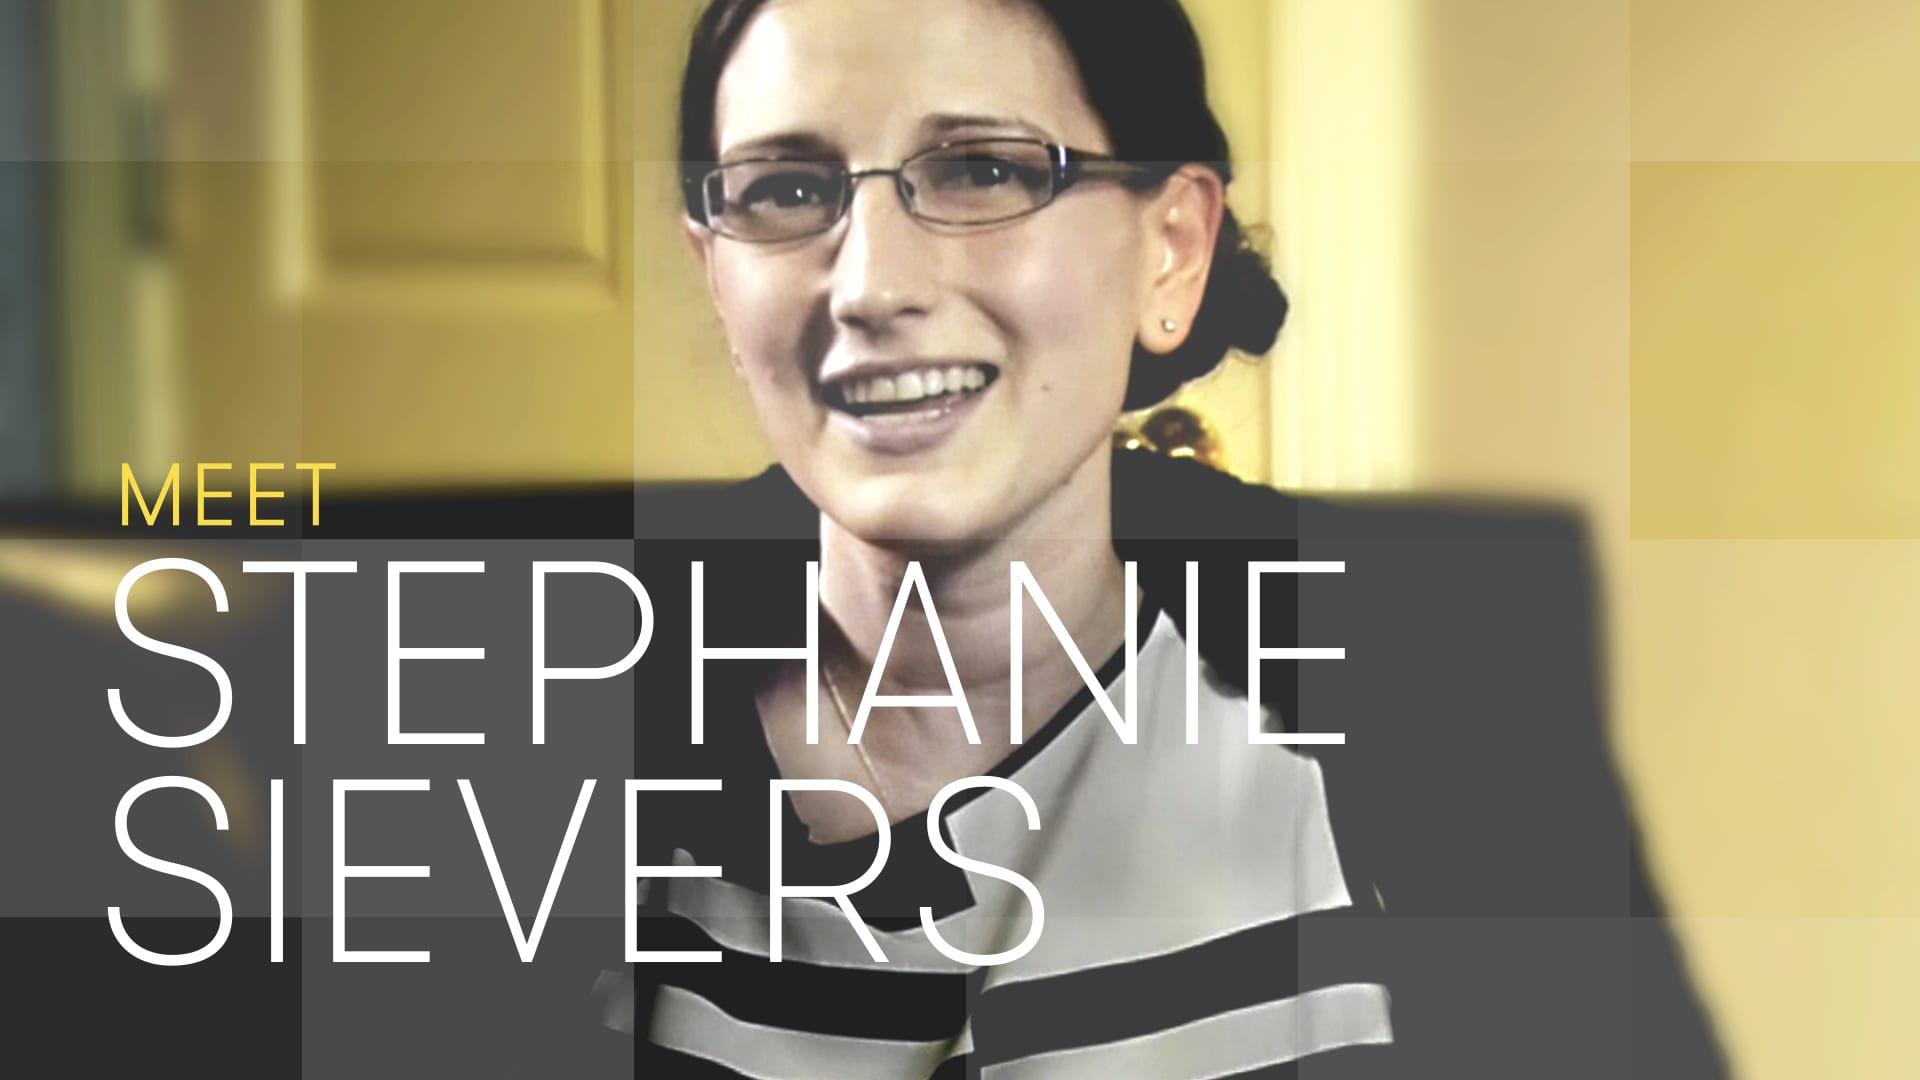 The Partner contestant Stephanie Sievers